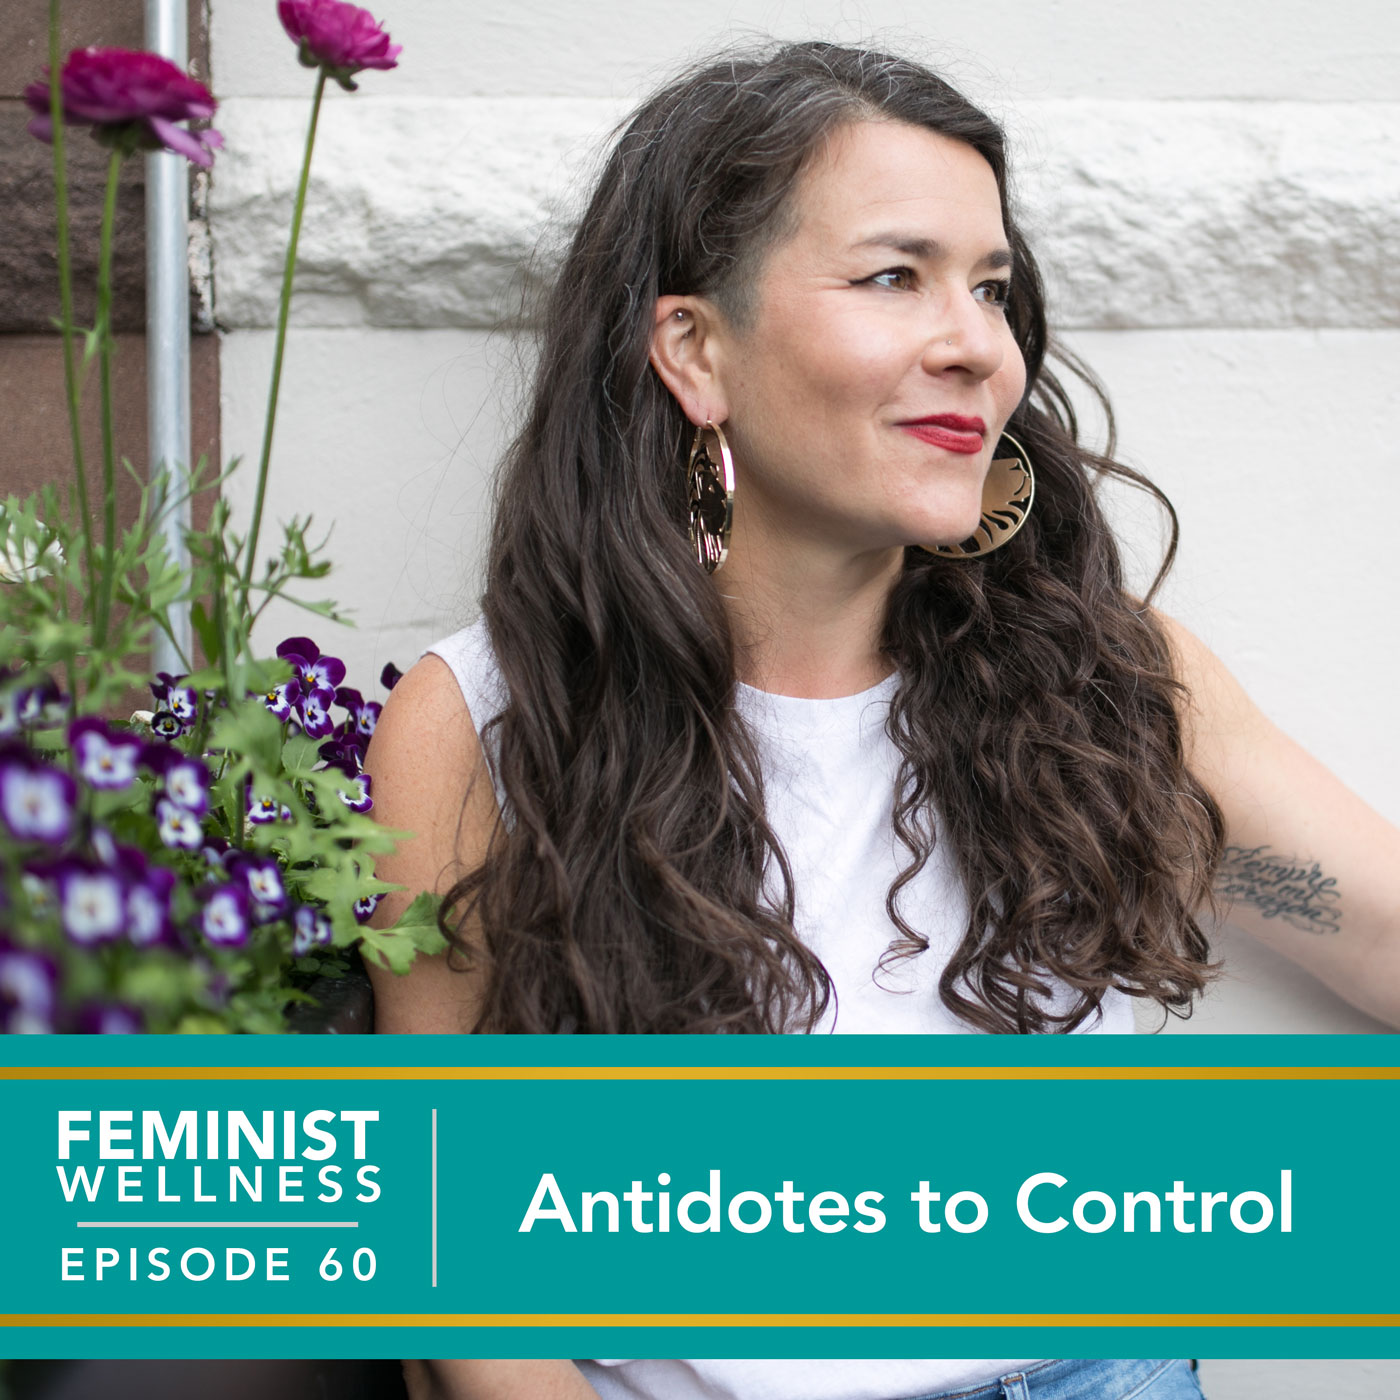 Antidotes to Control